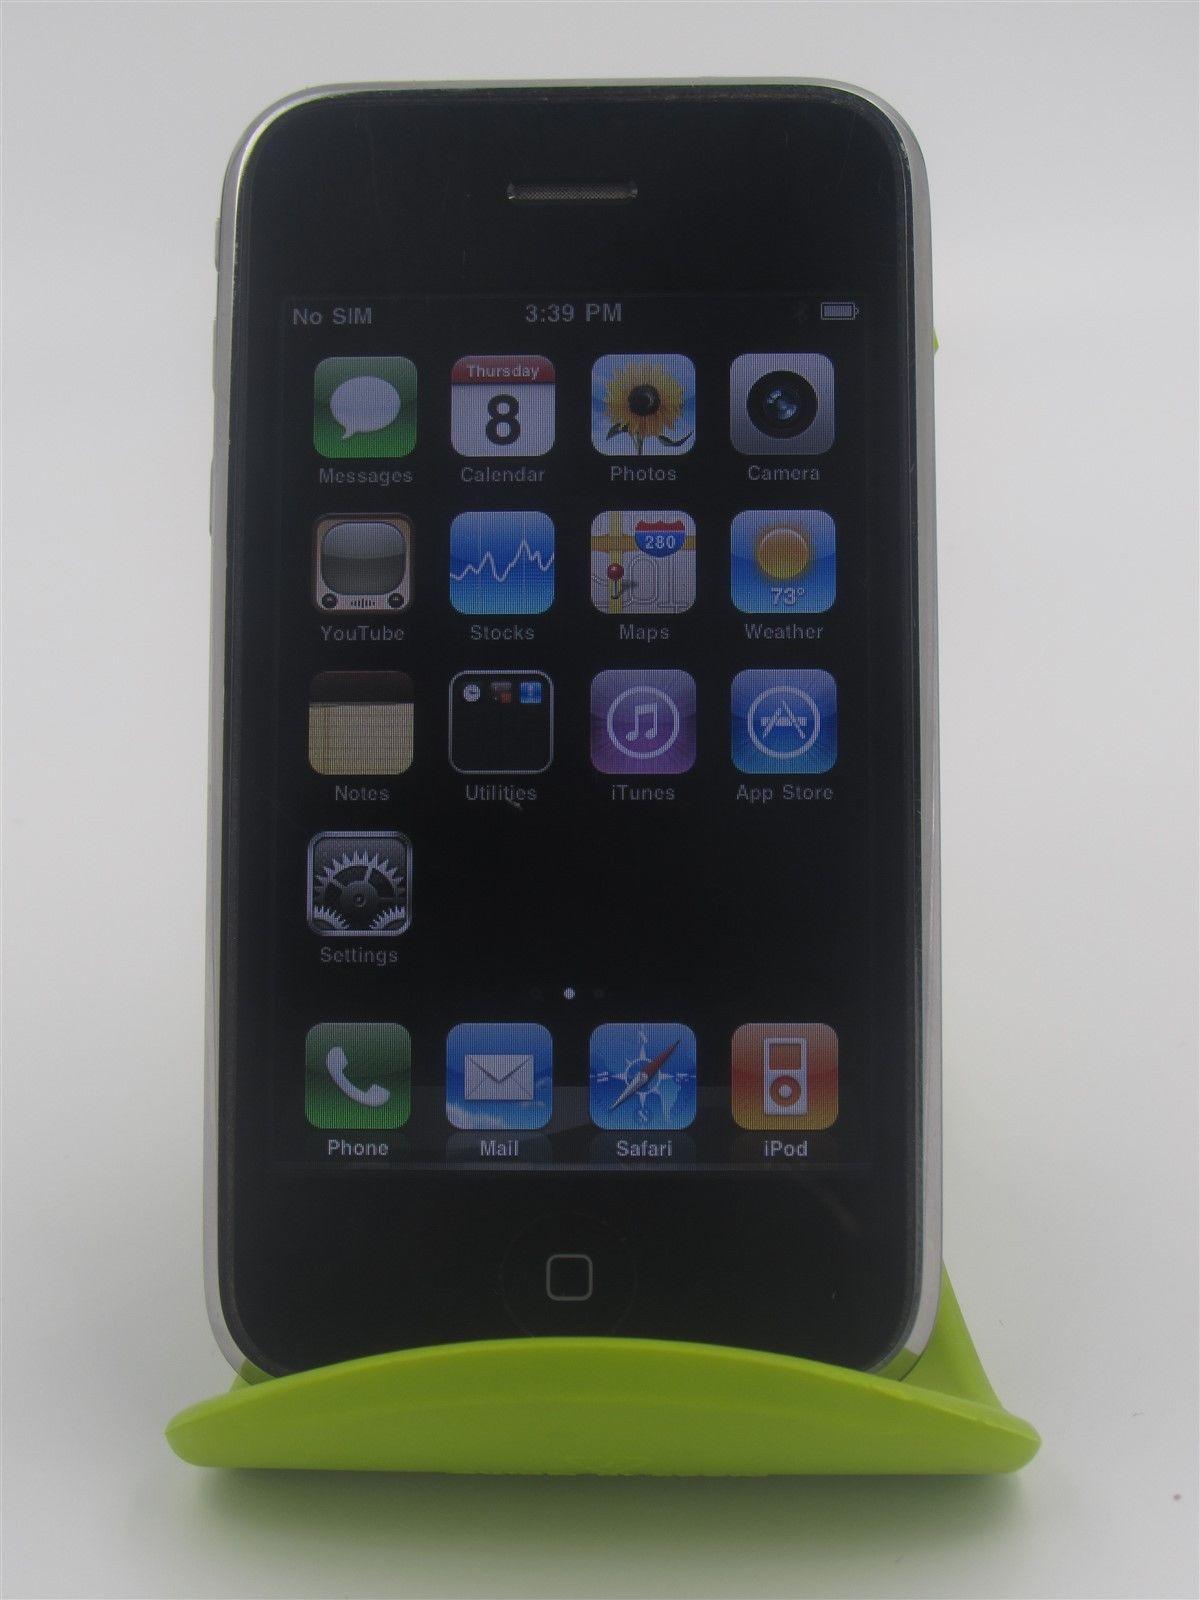 Apple iphone 3g a1241 unlocked smartphone black fair